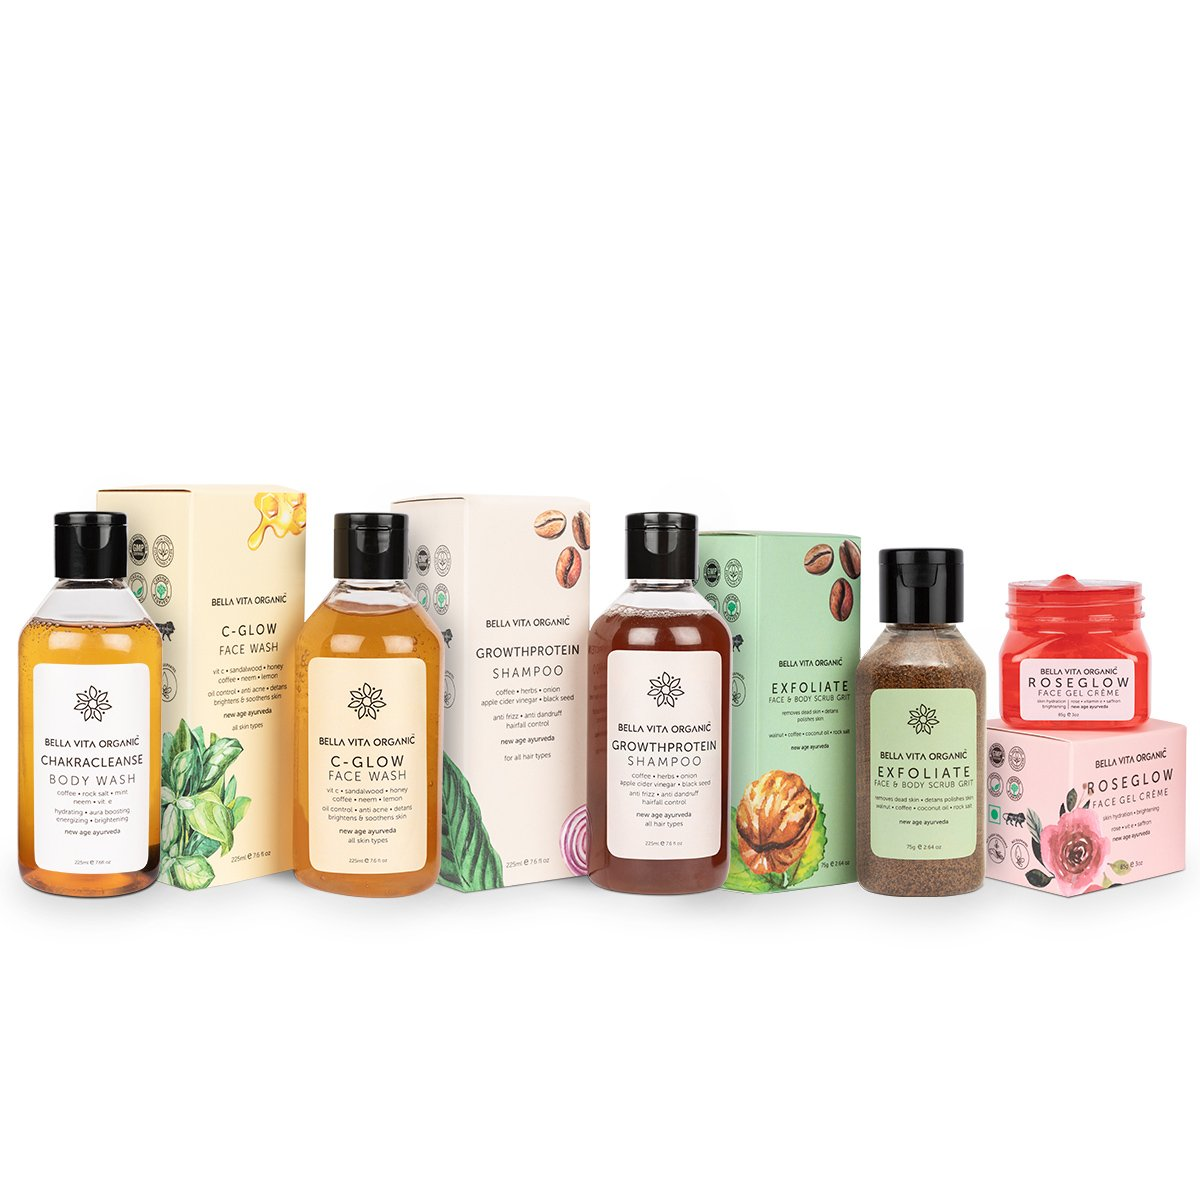 Face-wash_-Body-Wash_-Shampoo-Exfoliate_-Rose-Glow